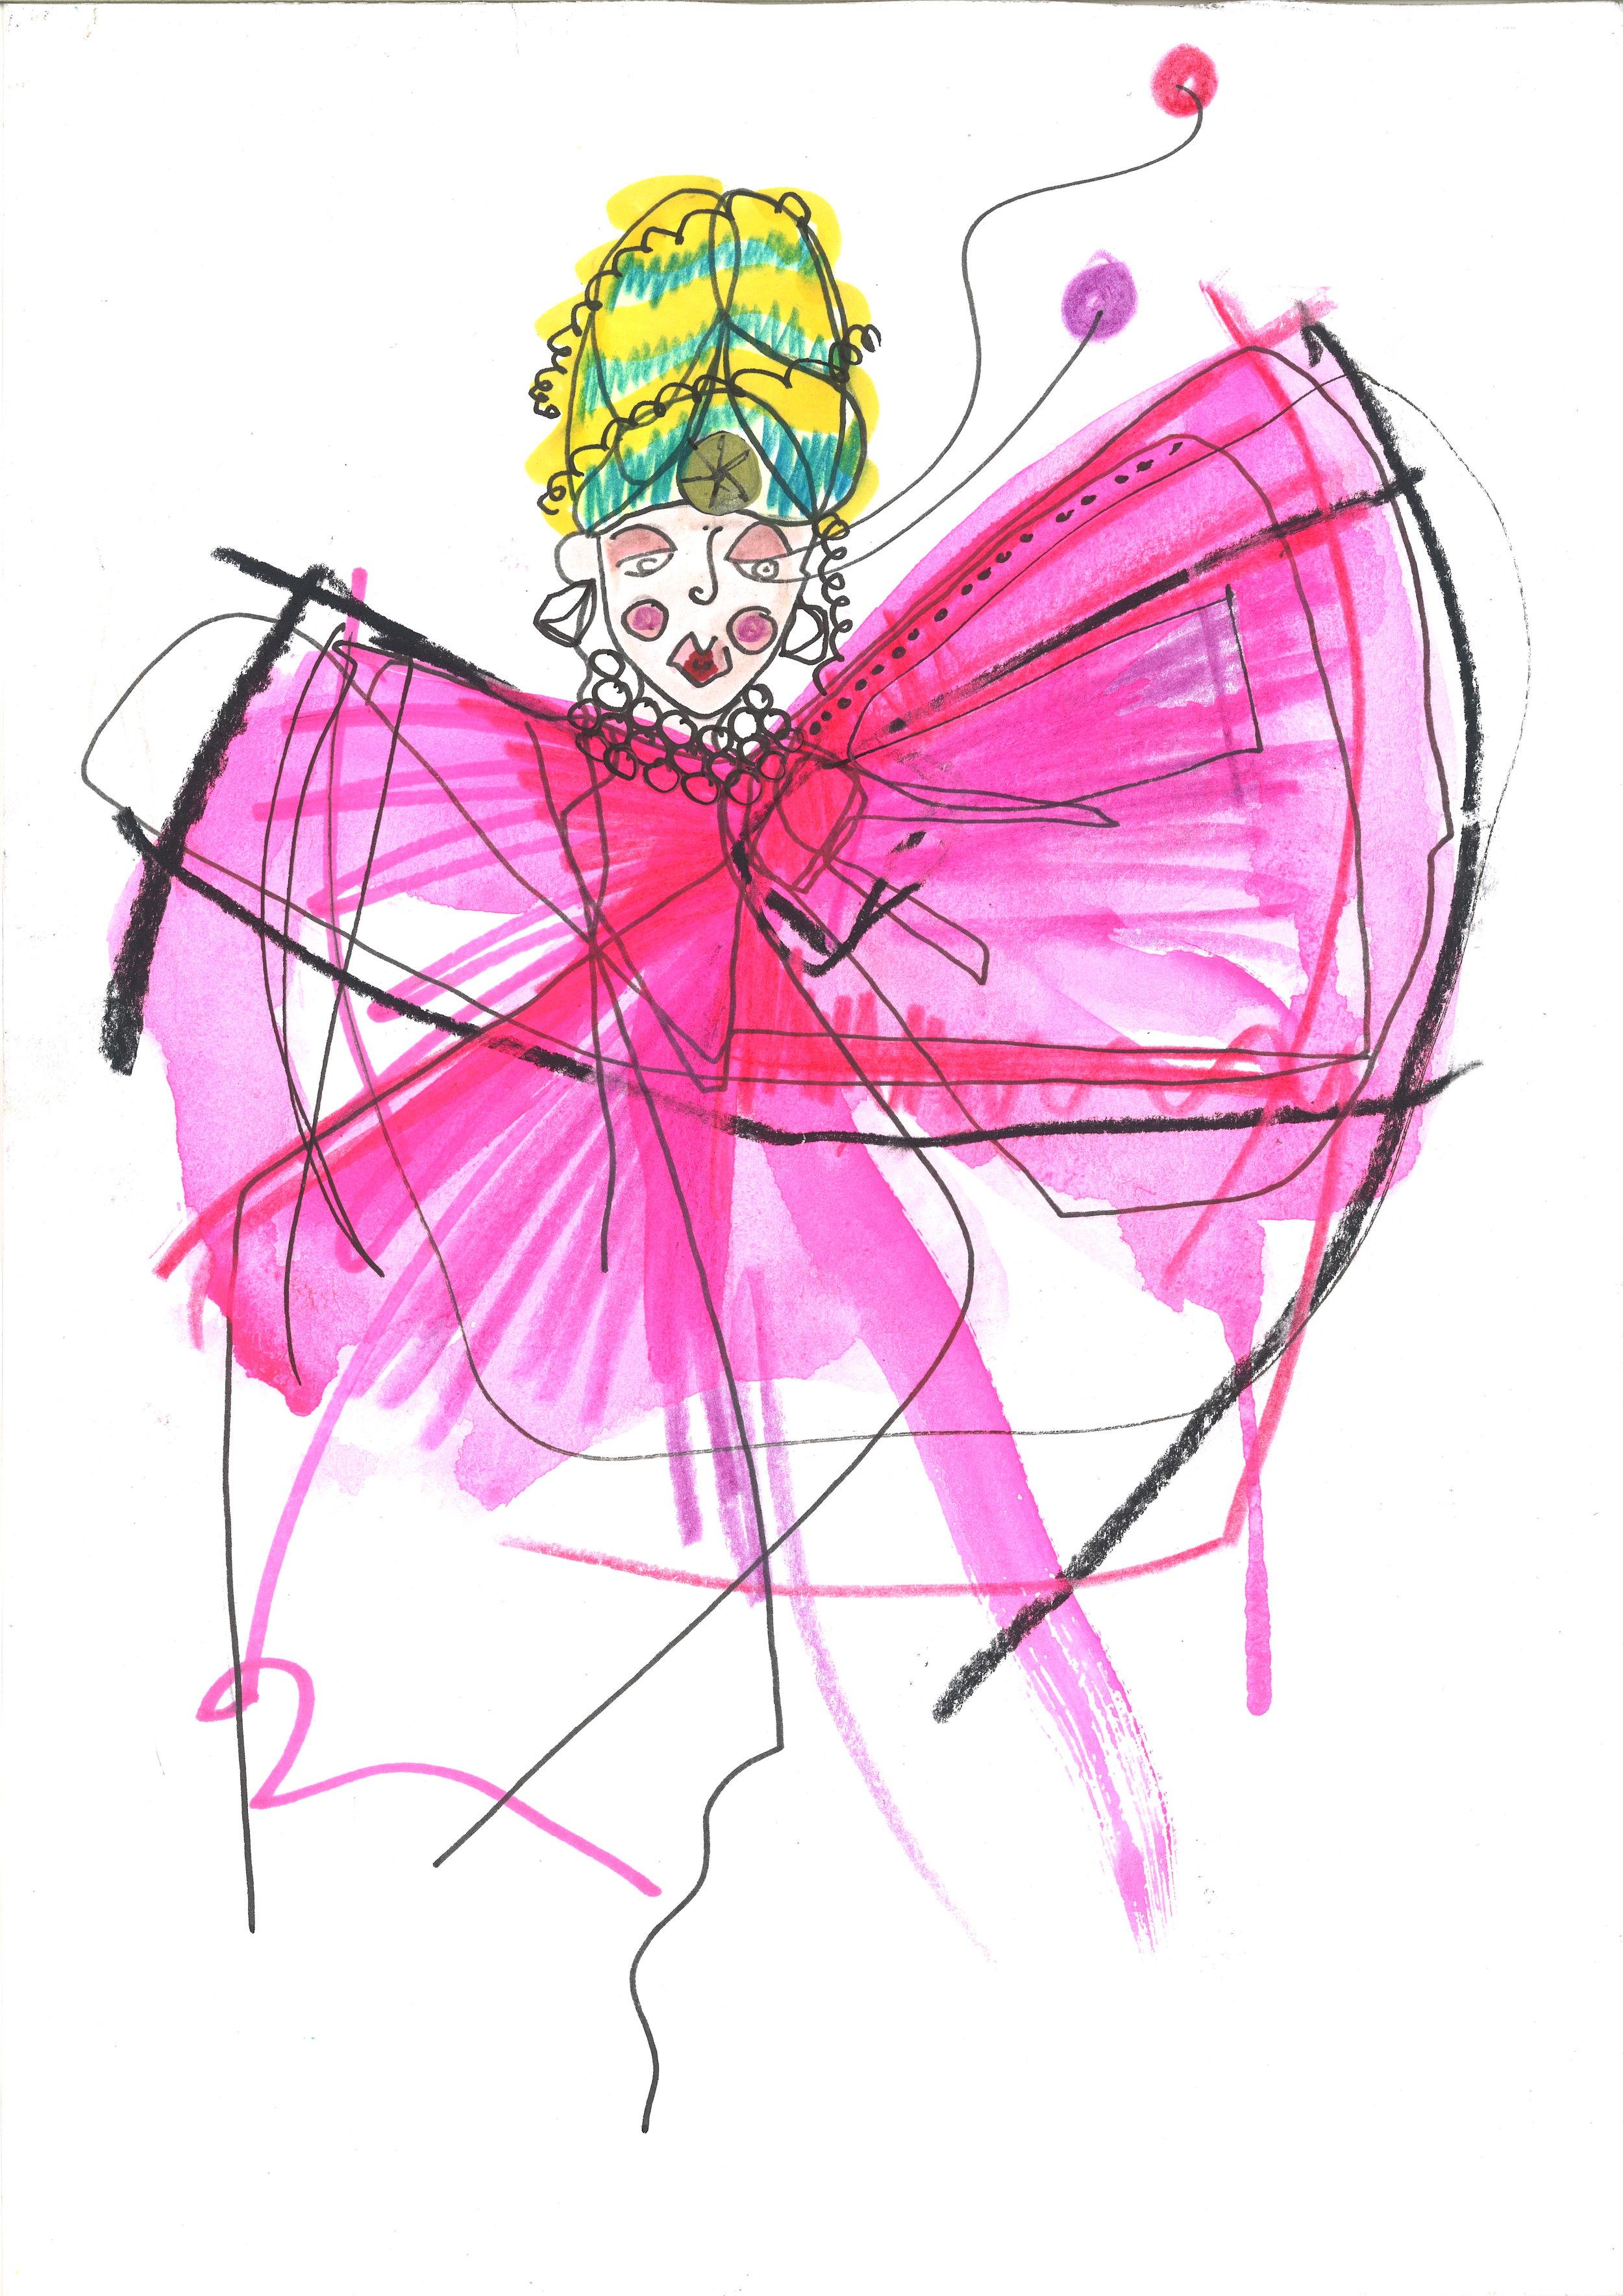 'Benzo Belle' ~ Empress illustration by @HouseofKiyote